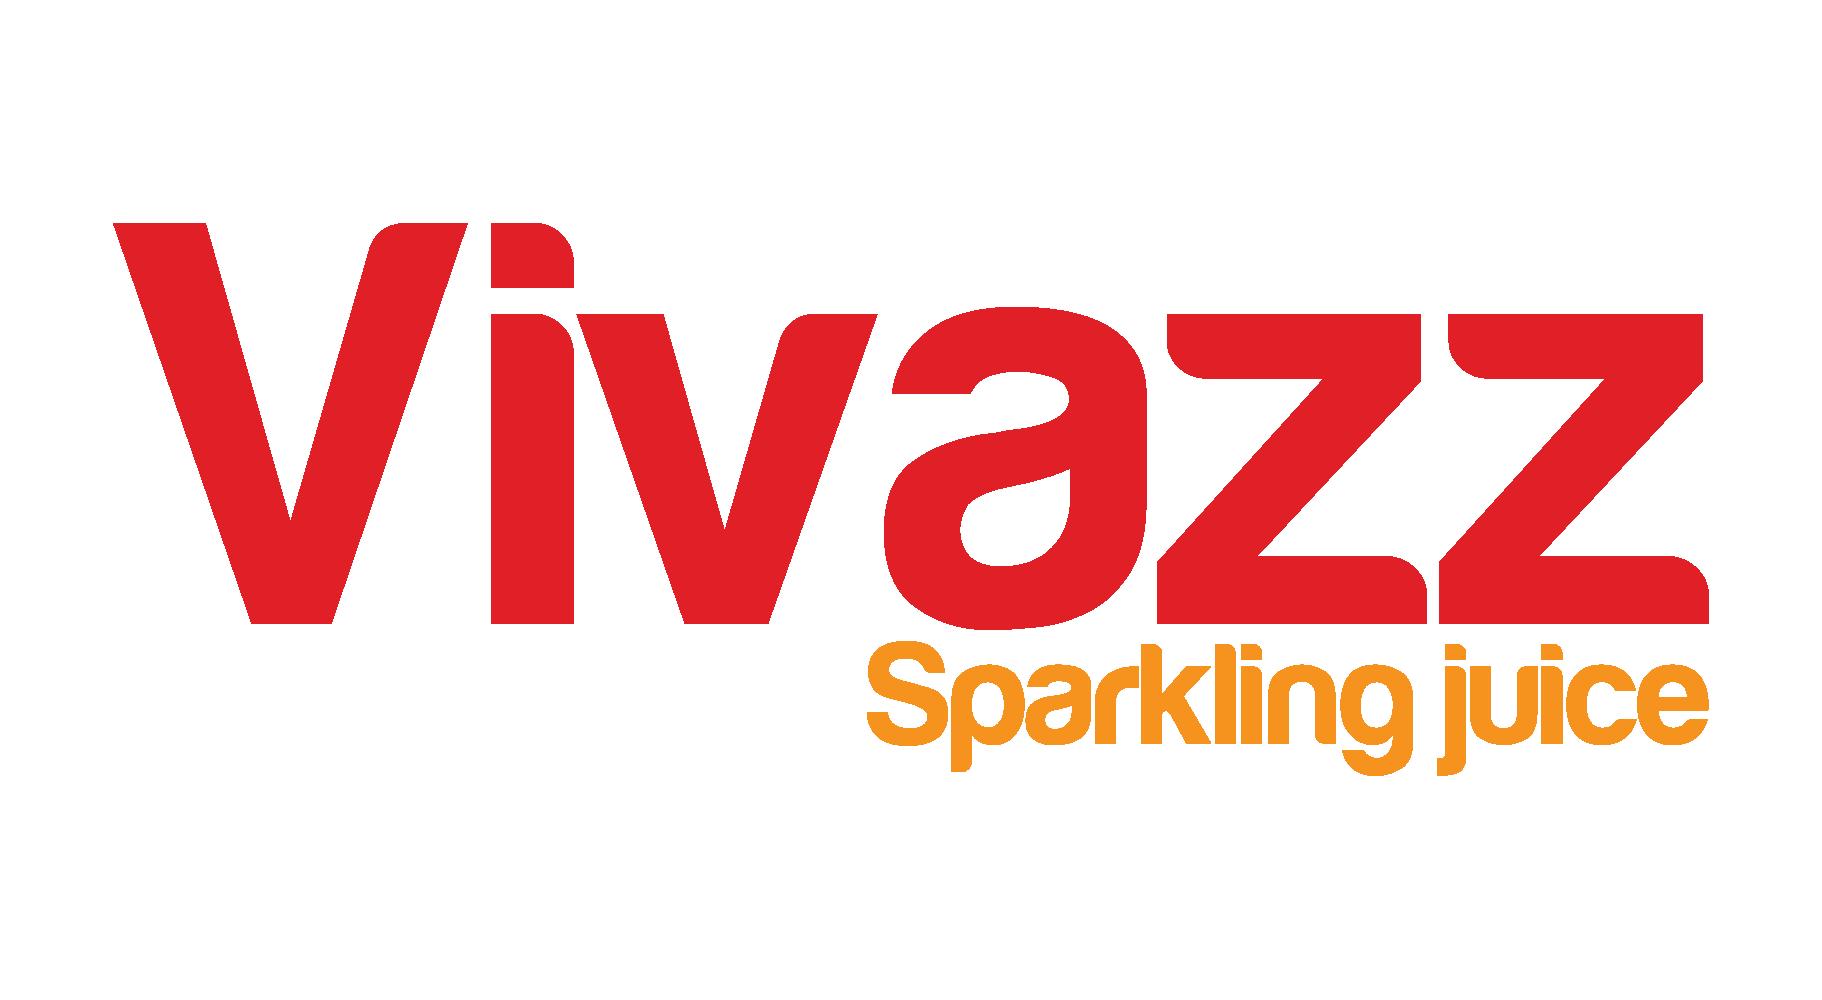 Vivazz